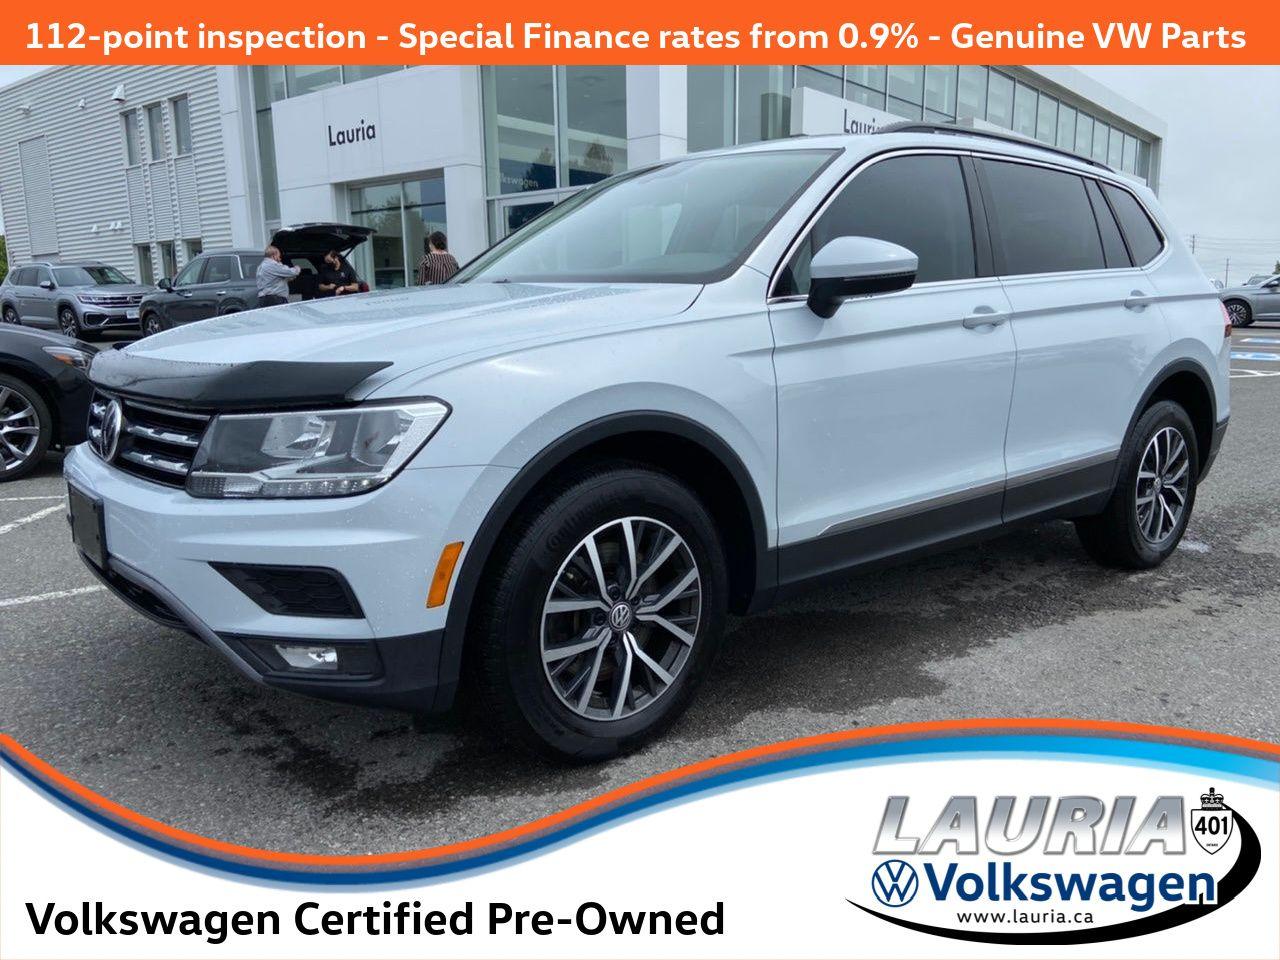 used 2018 Volkswagen Tiguan car, priced at $25,988